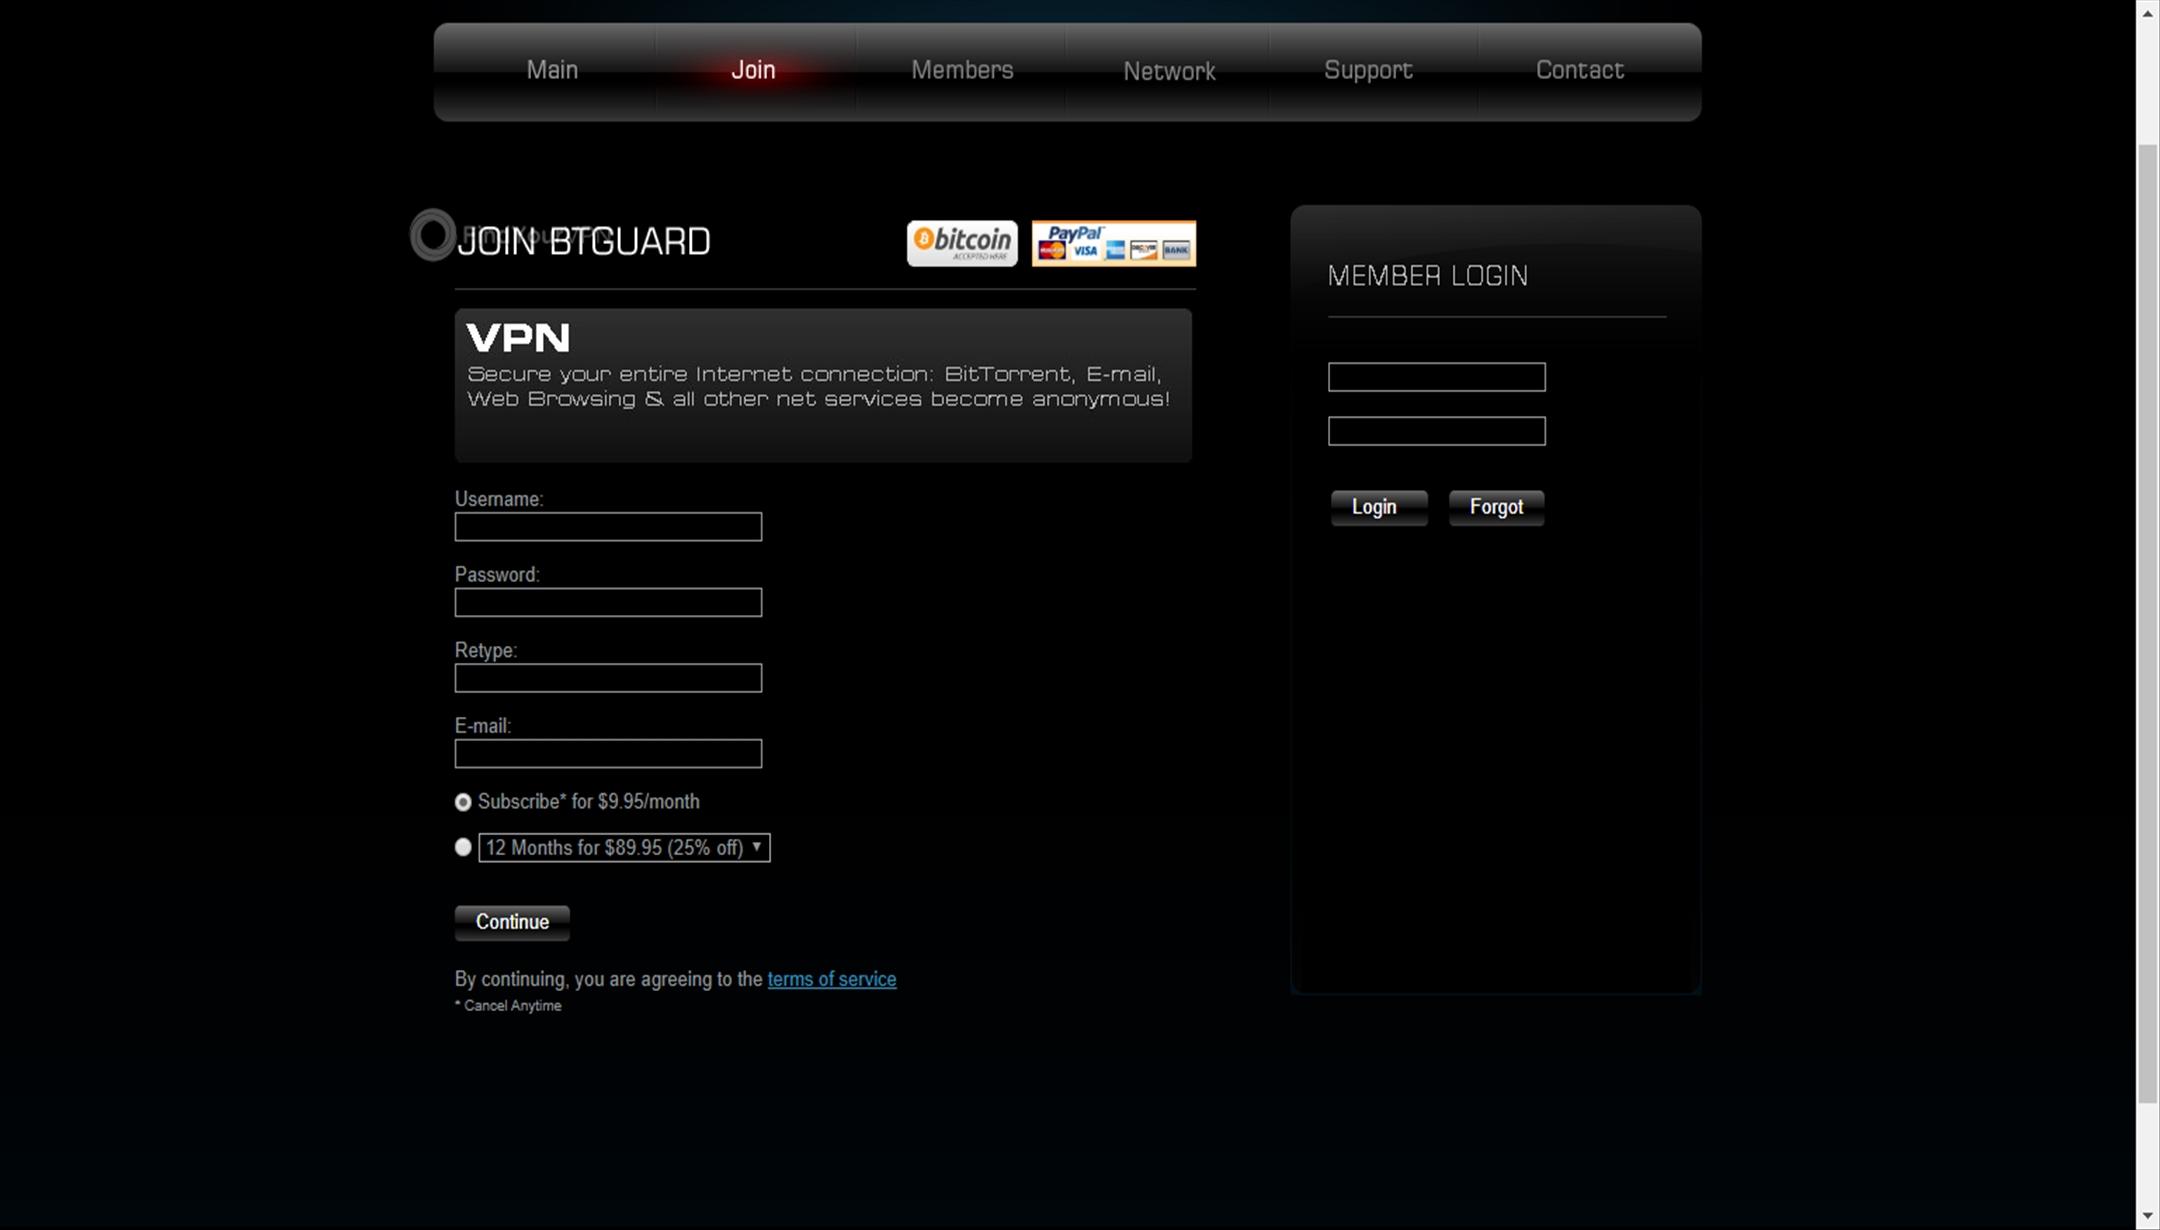 BTGuard credentials creating account